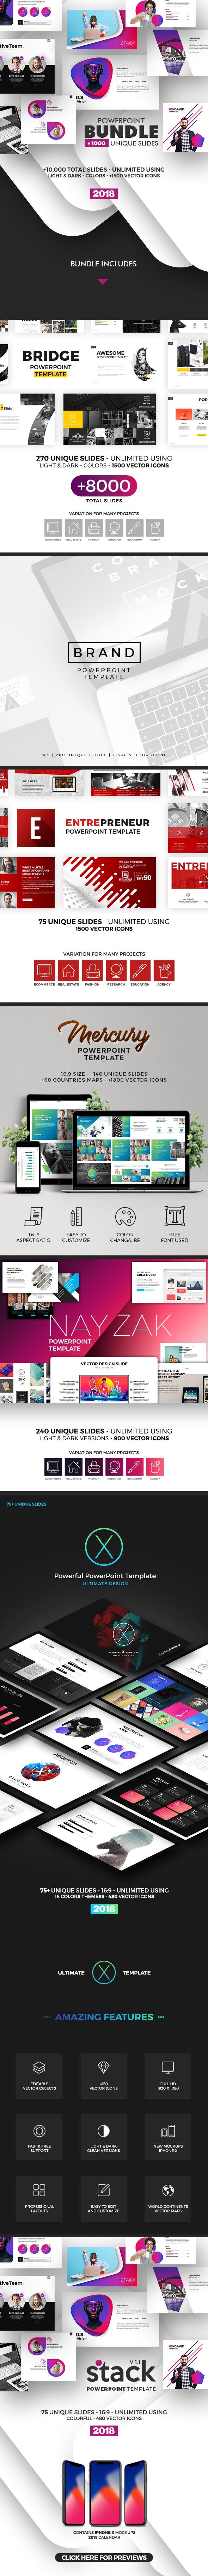 7 PowerPoint Templates - Bundle - Business PowerPoint Templates